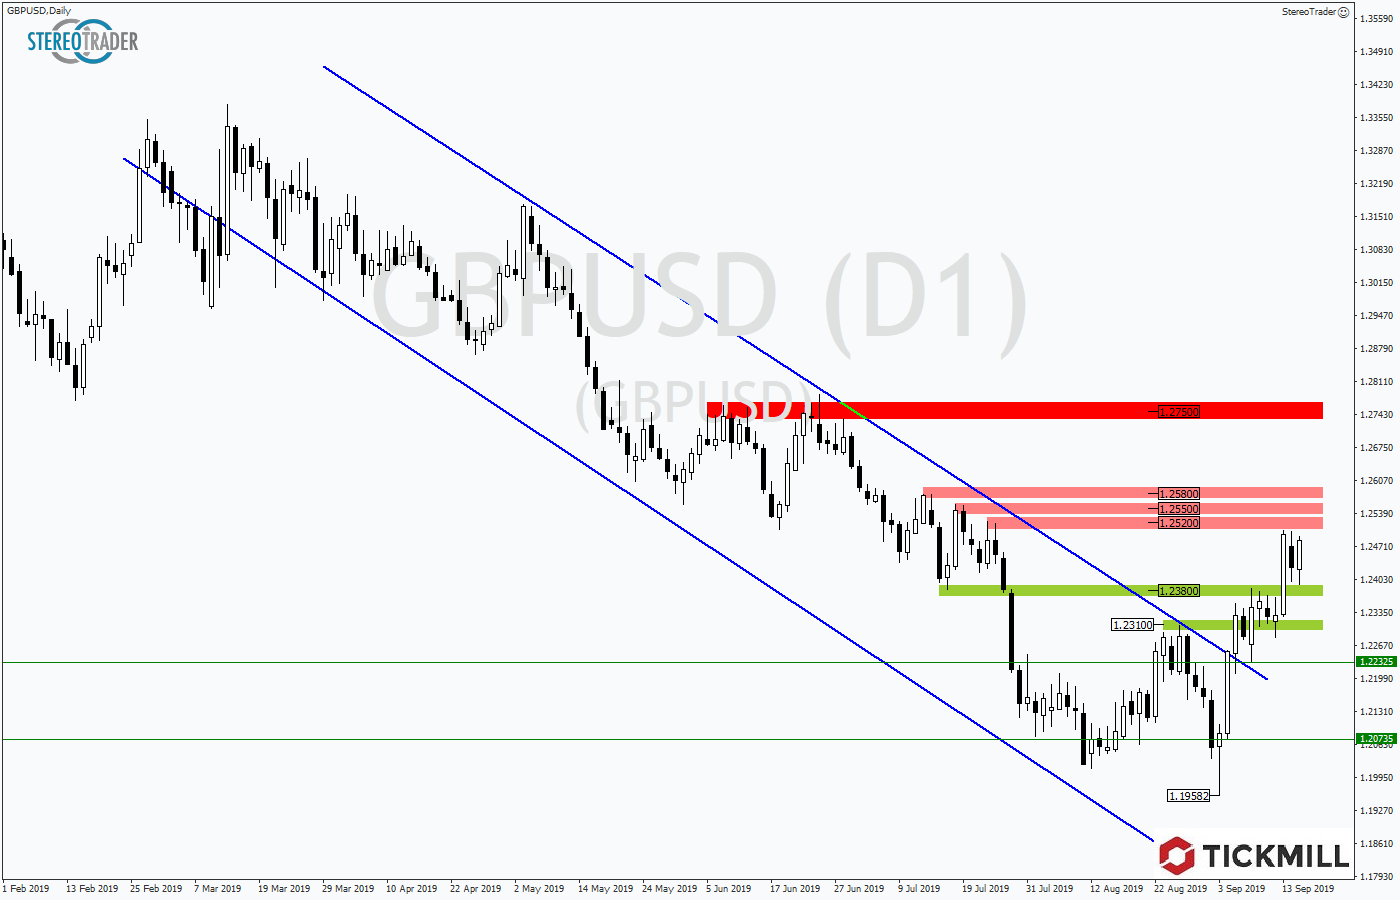 Tickmill-Analyse: GBPUSD bricht Trendkanal